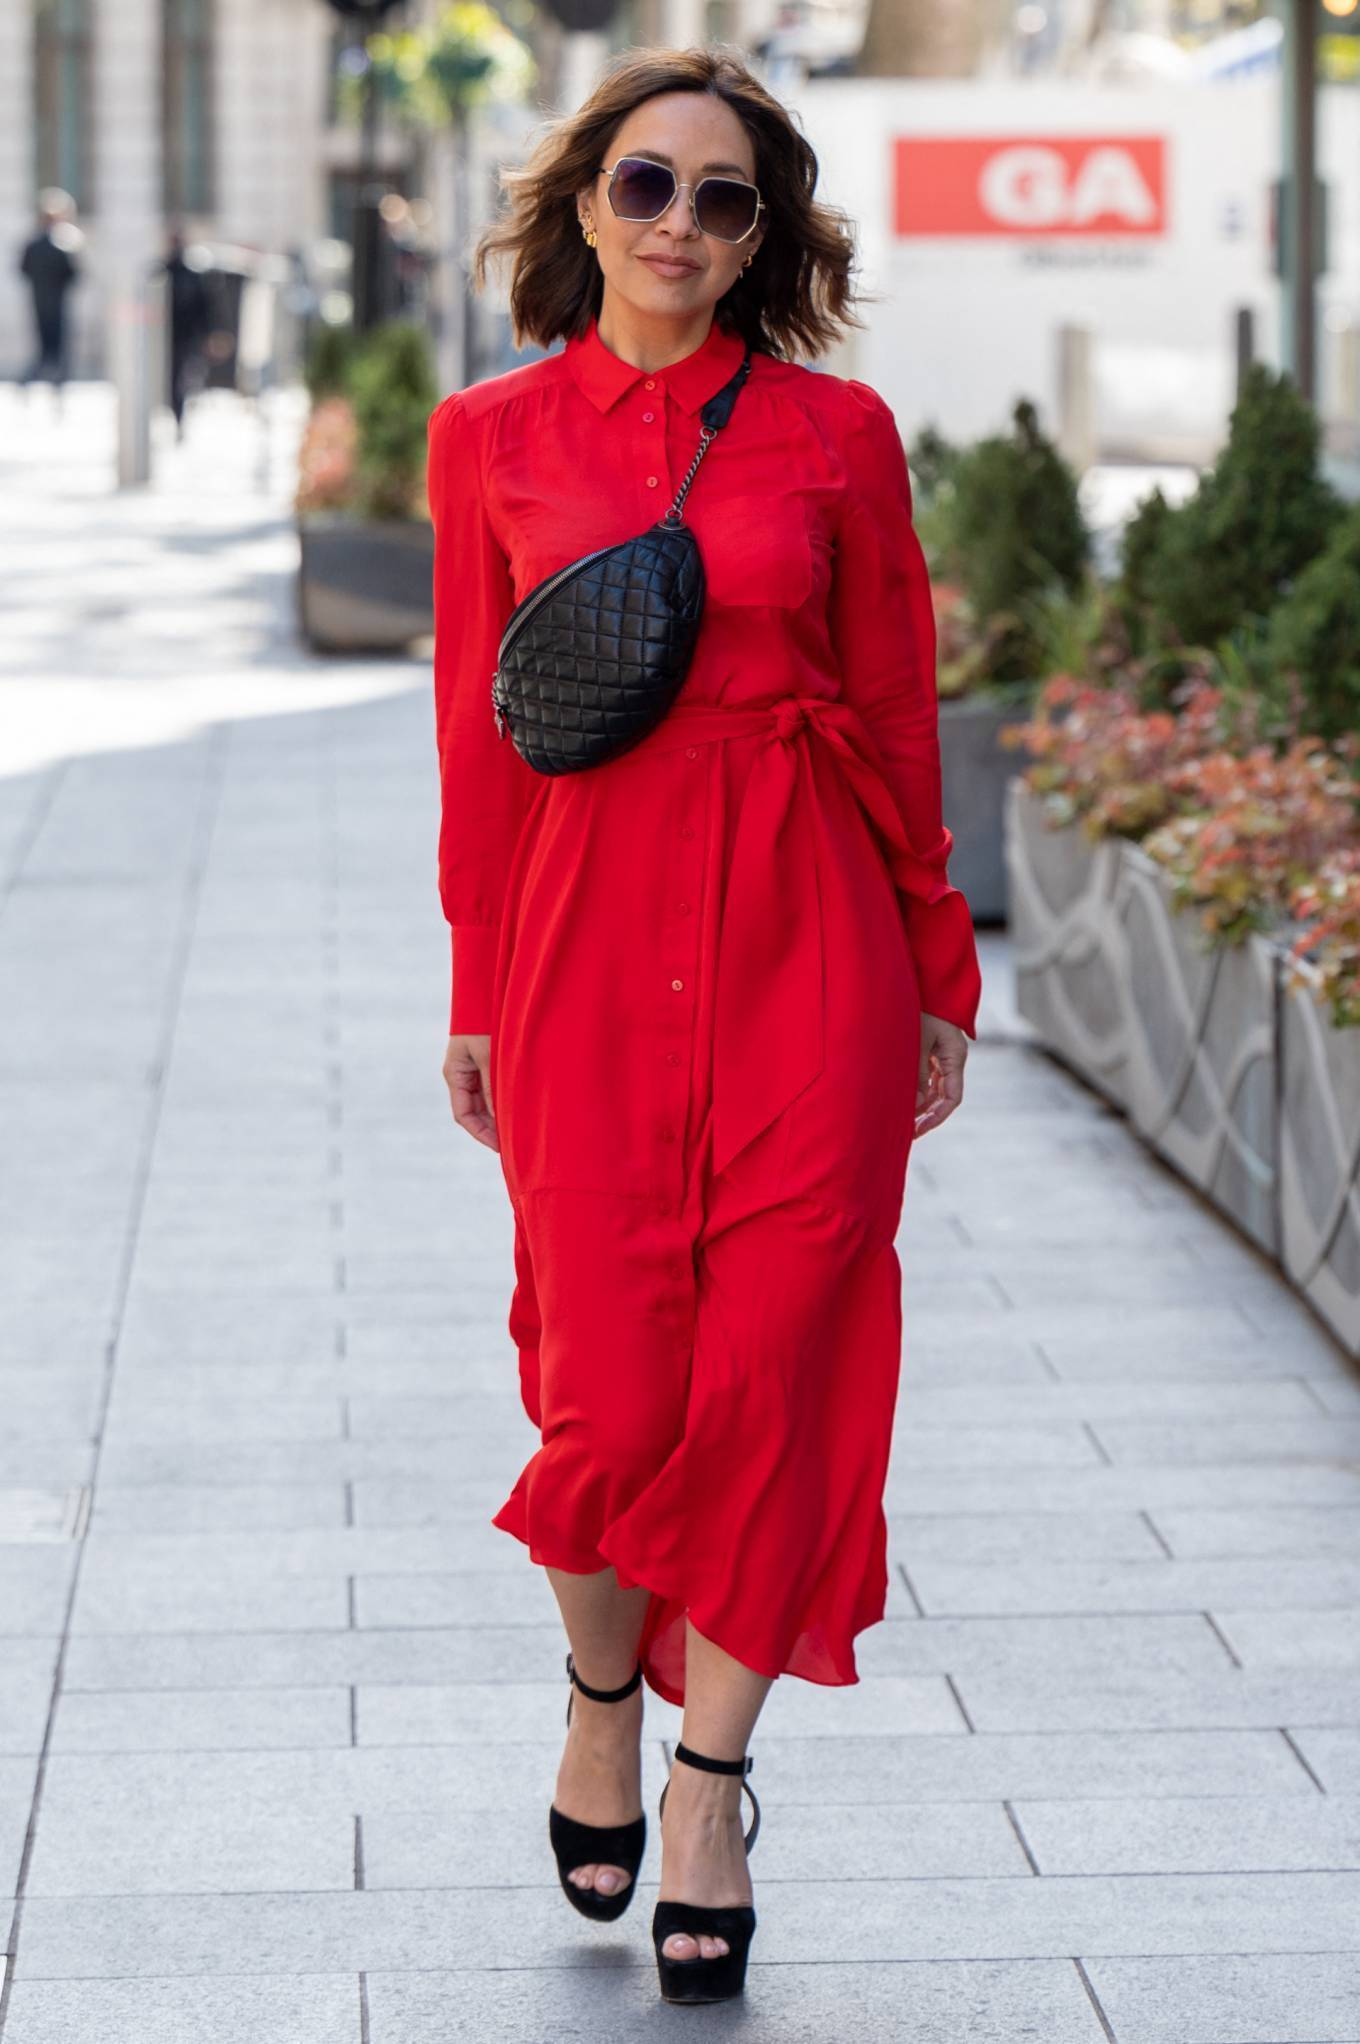 Myleene Klass - In maxi red dress arriving at Global Studios in London